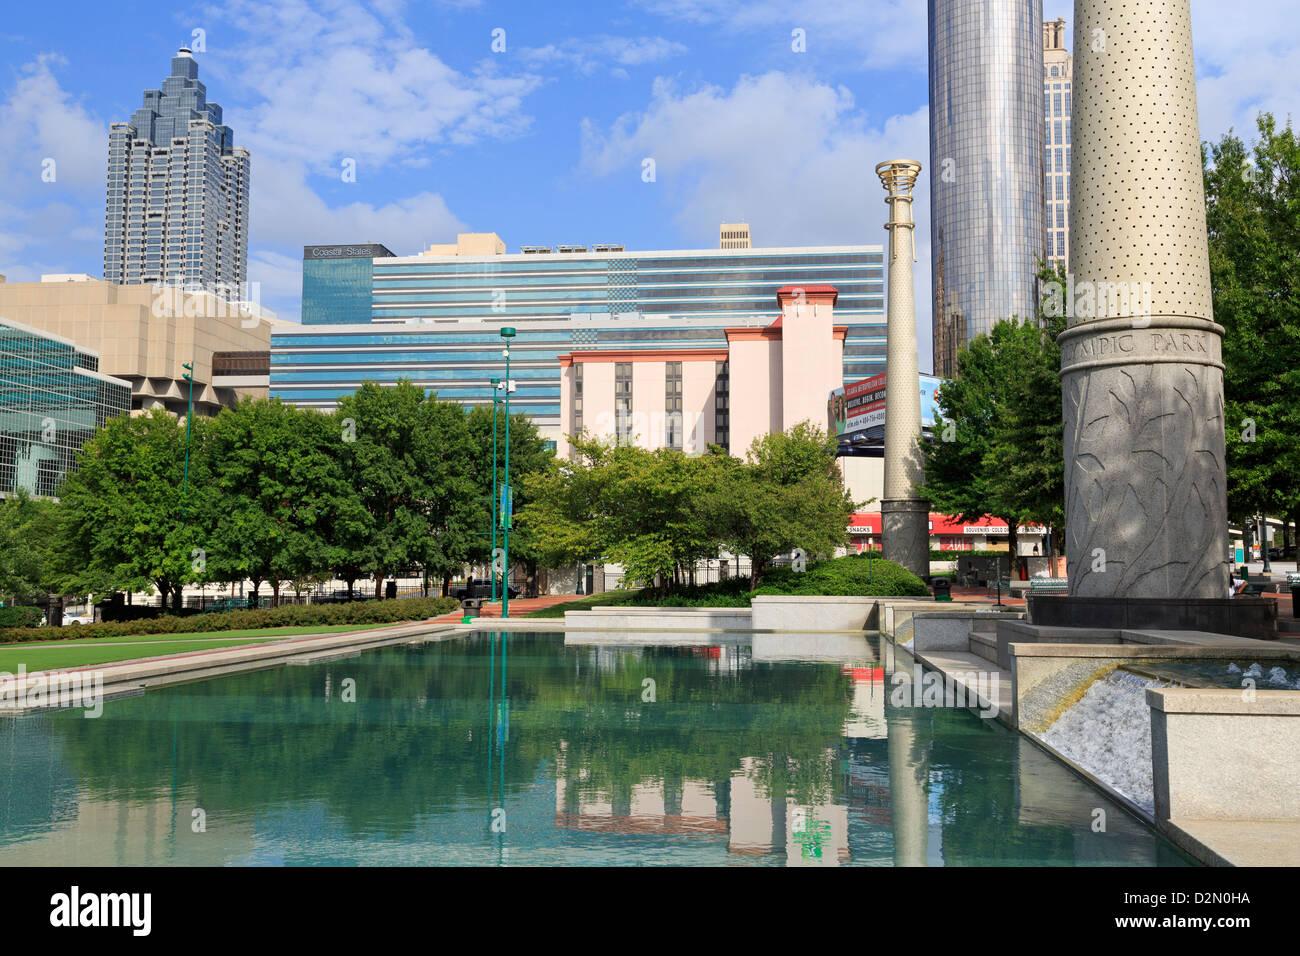 Centennial Olympic Park, Atlanta, Georgia, United States of America, North America - Stock Image